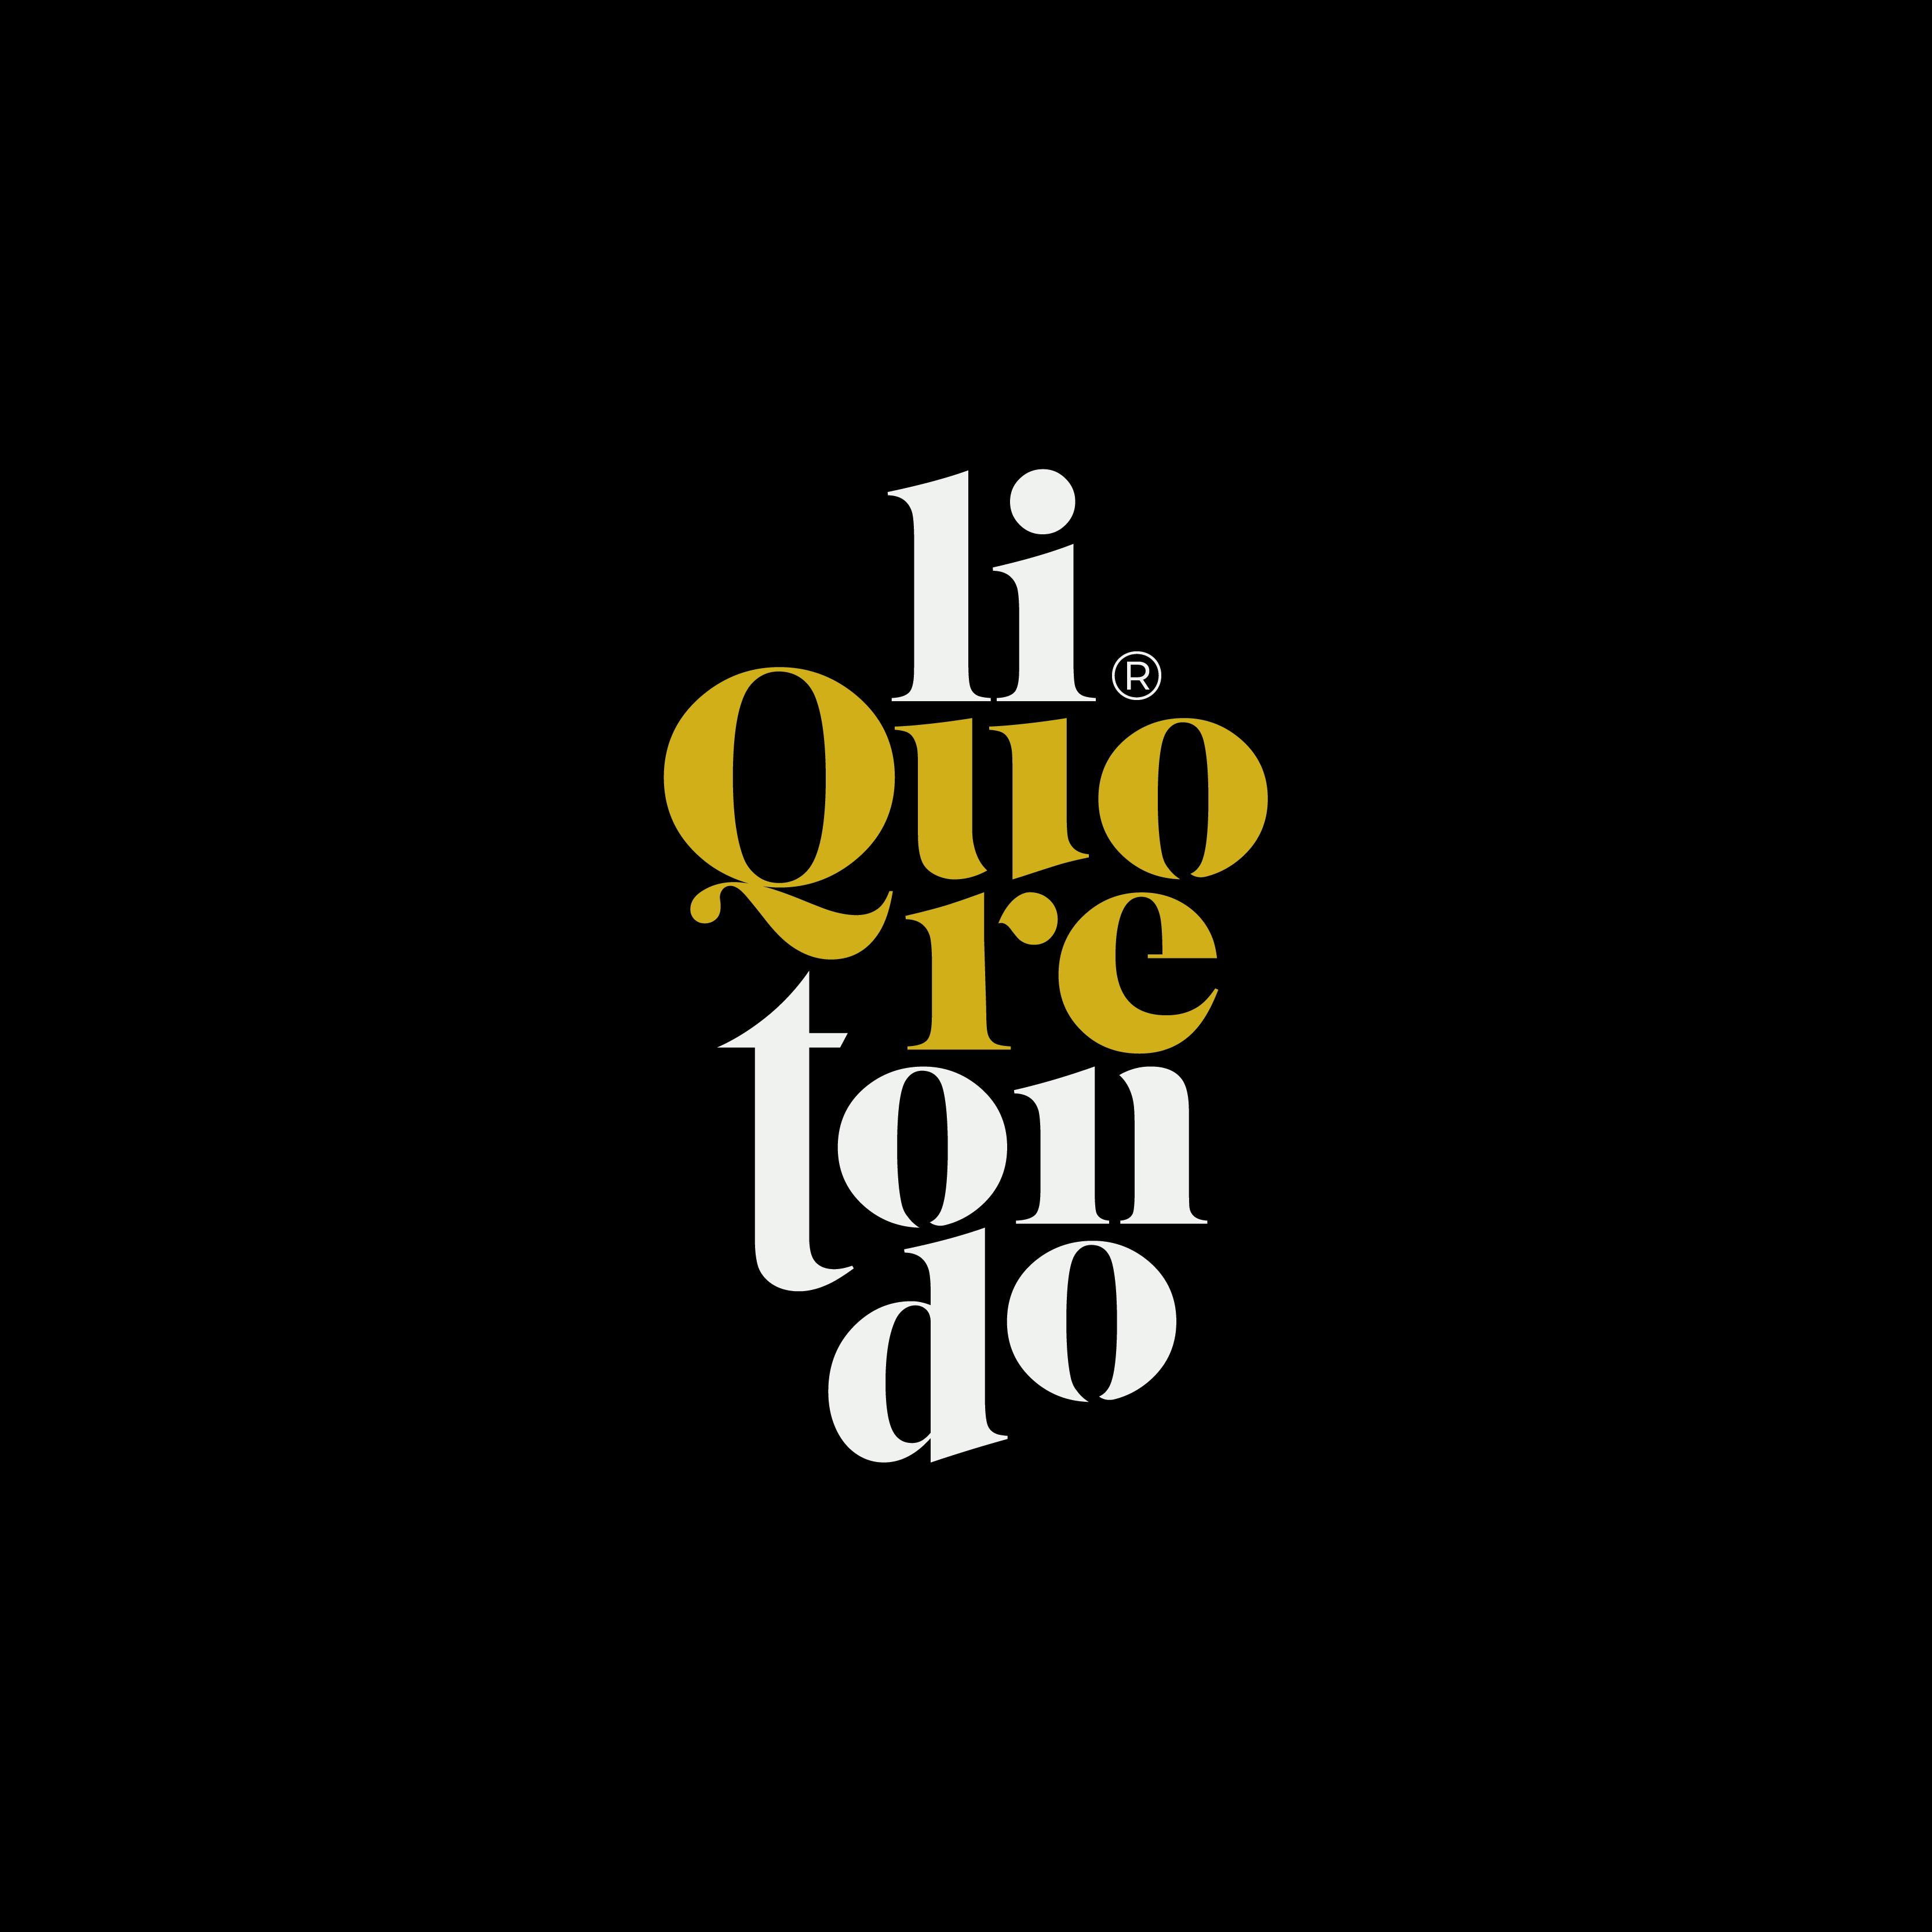 logo-tondo_Tavola-disegno-1